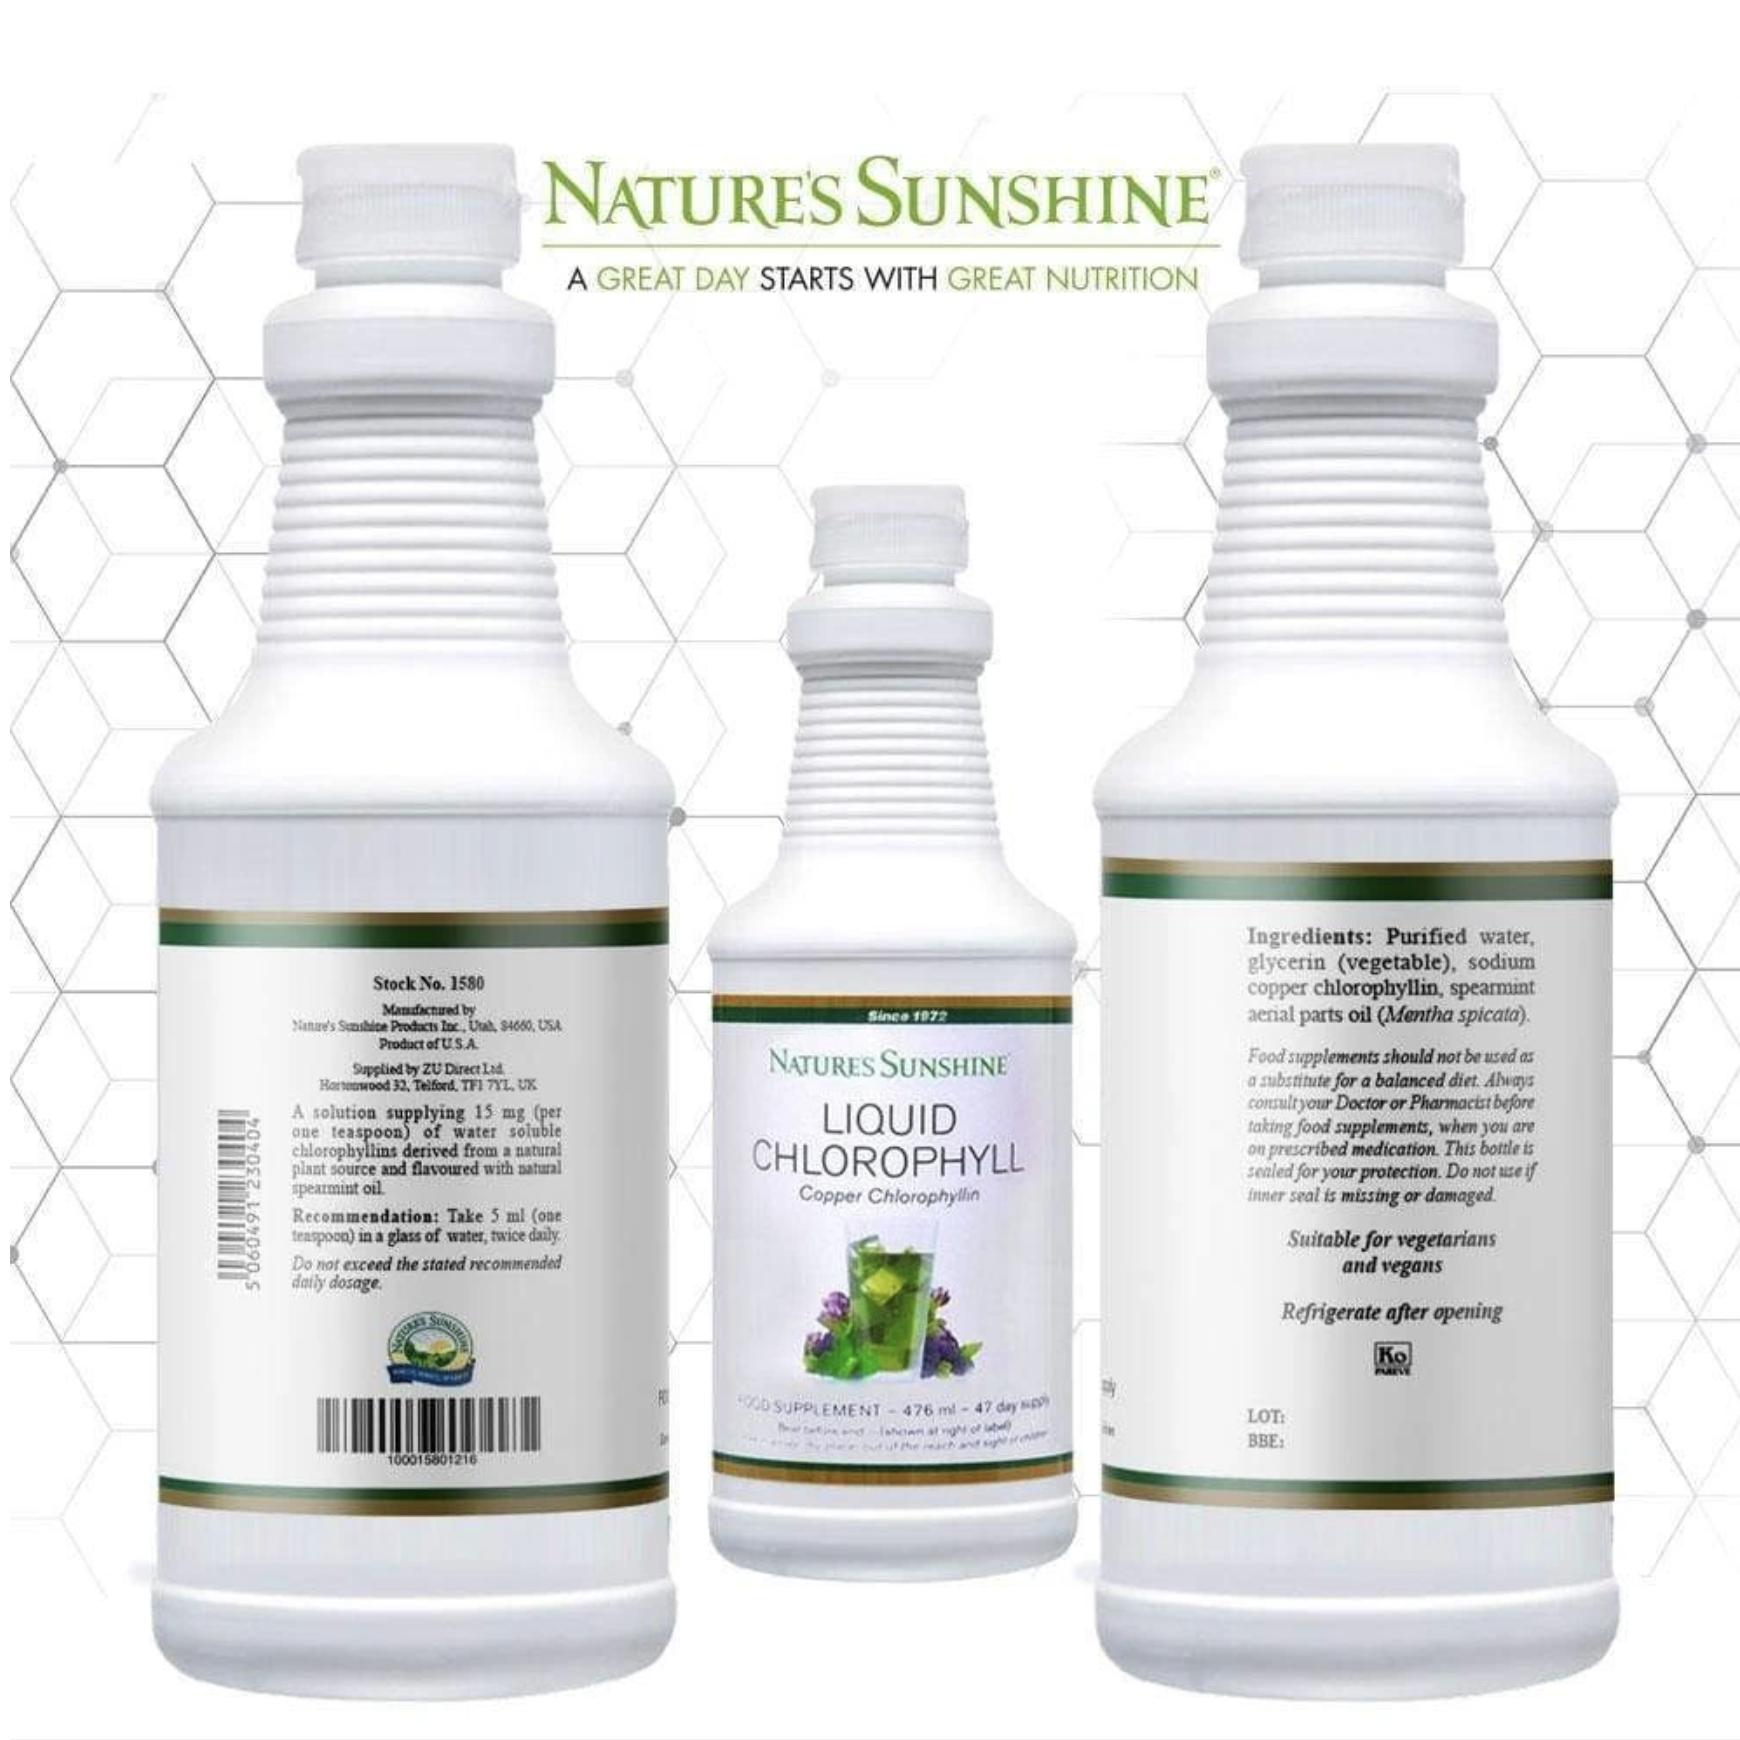 Nature's Sunshine Liquid Chlorophyll Orders